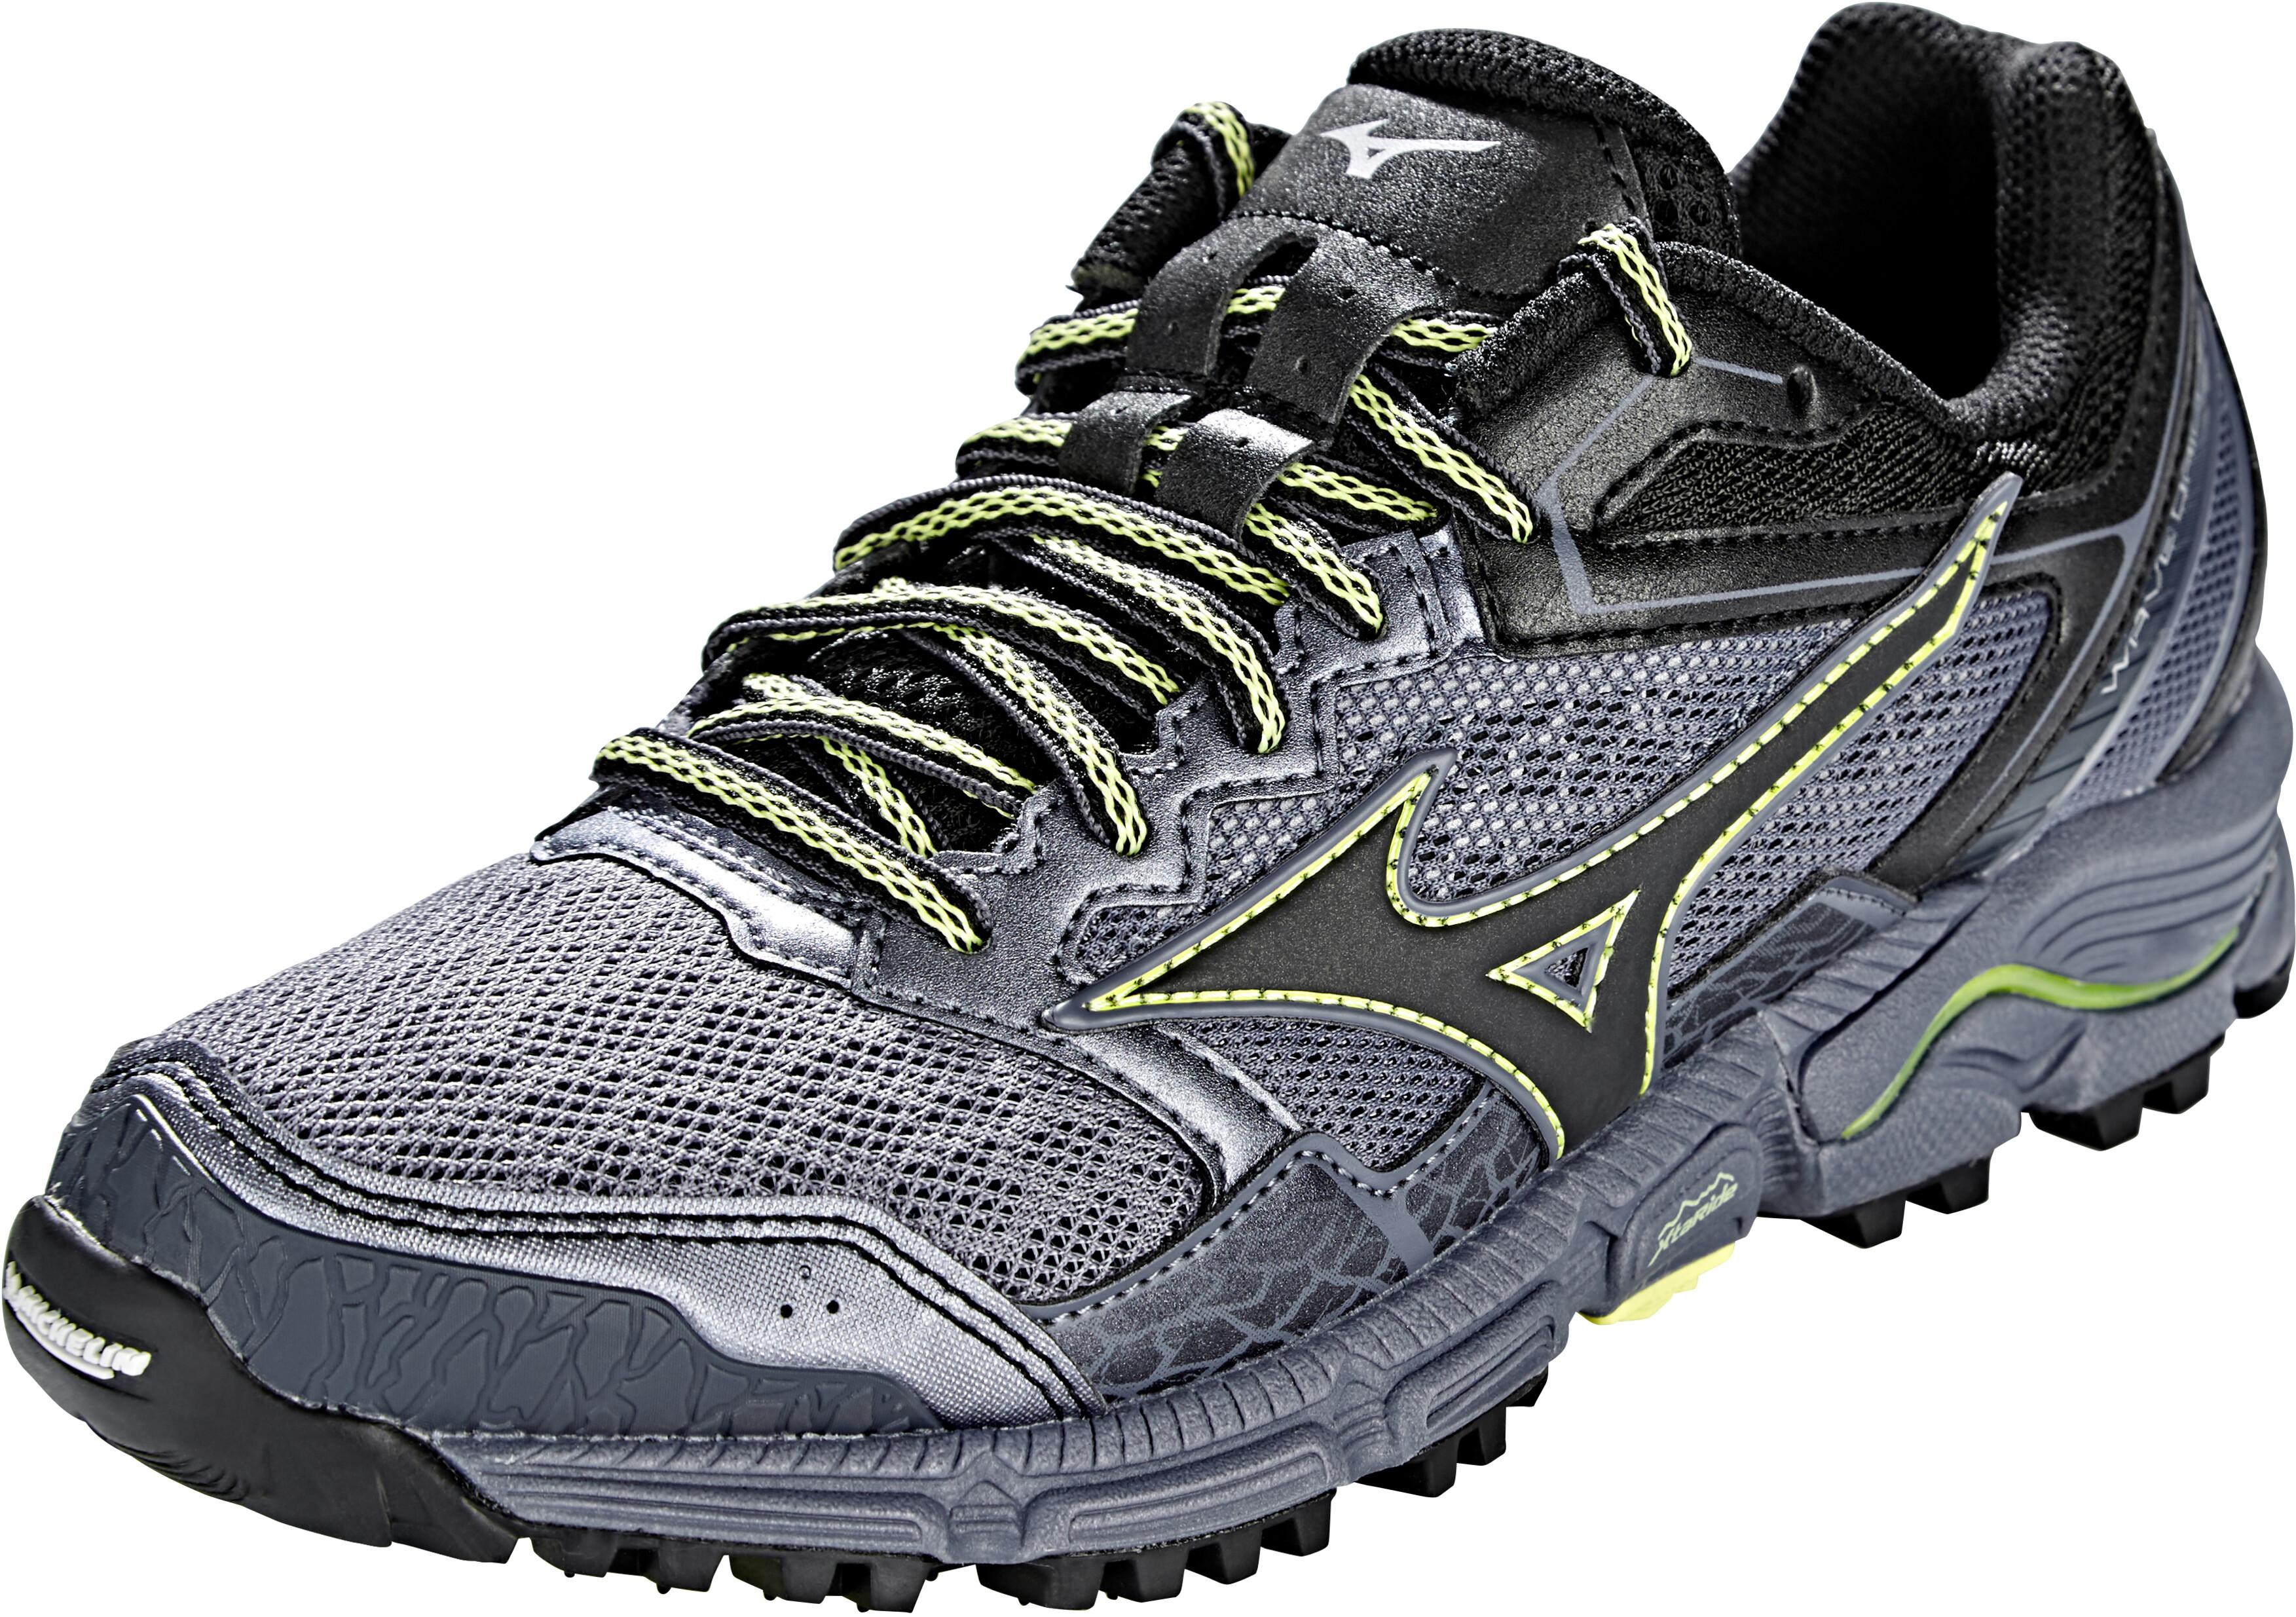 premium selection 48ce8 f3a6c Mizuno Wave Daichi 3 Running Shoes Women folkstone gray/black/sunny lime